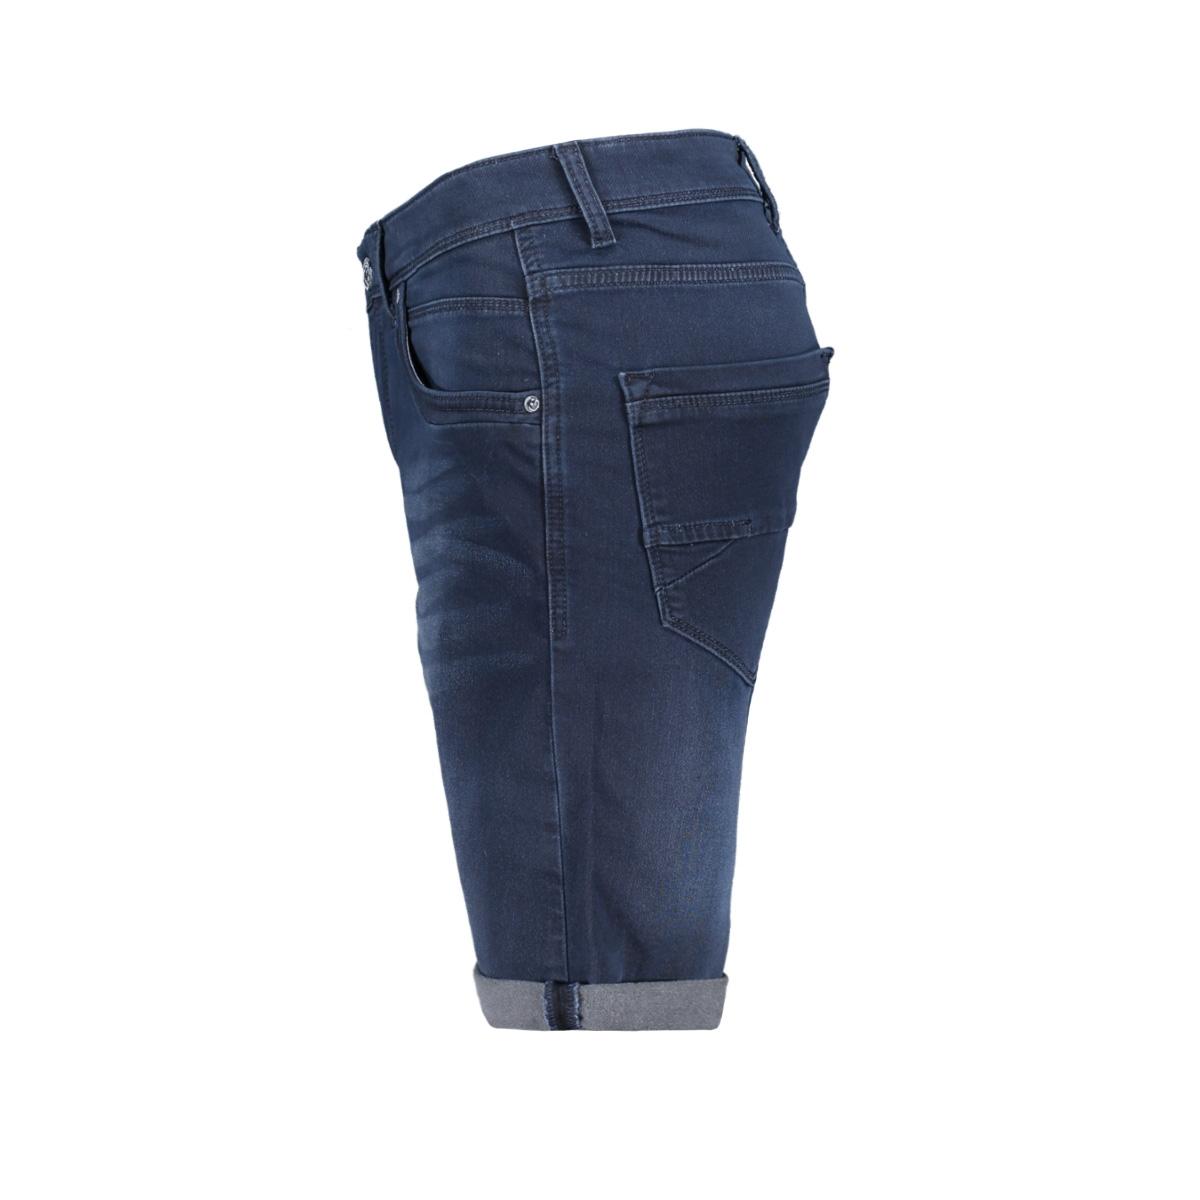 denim short 82690 gabbiano korte broek faded